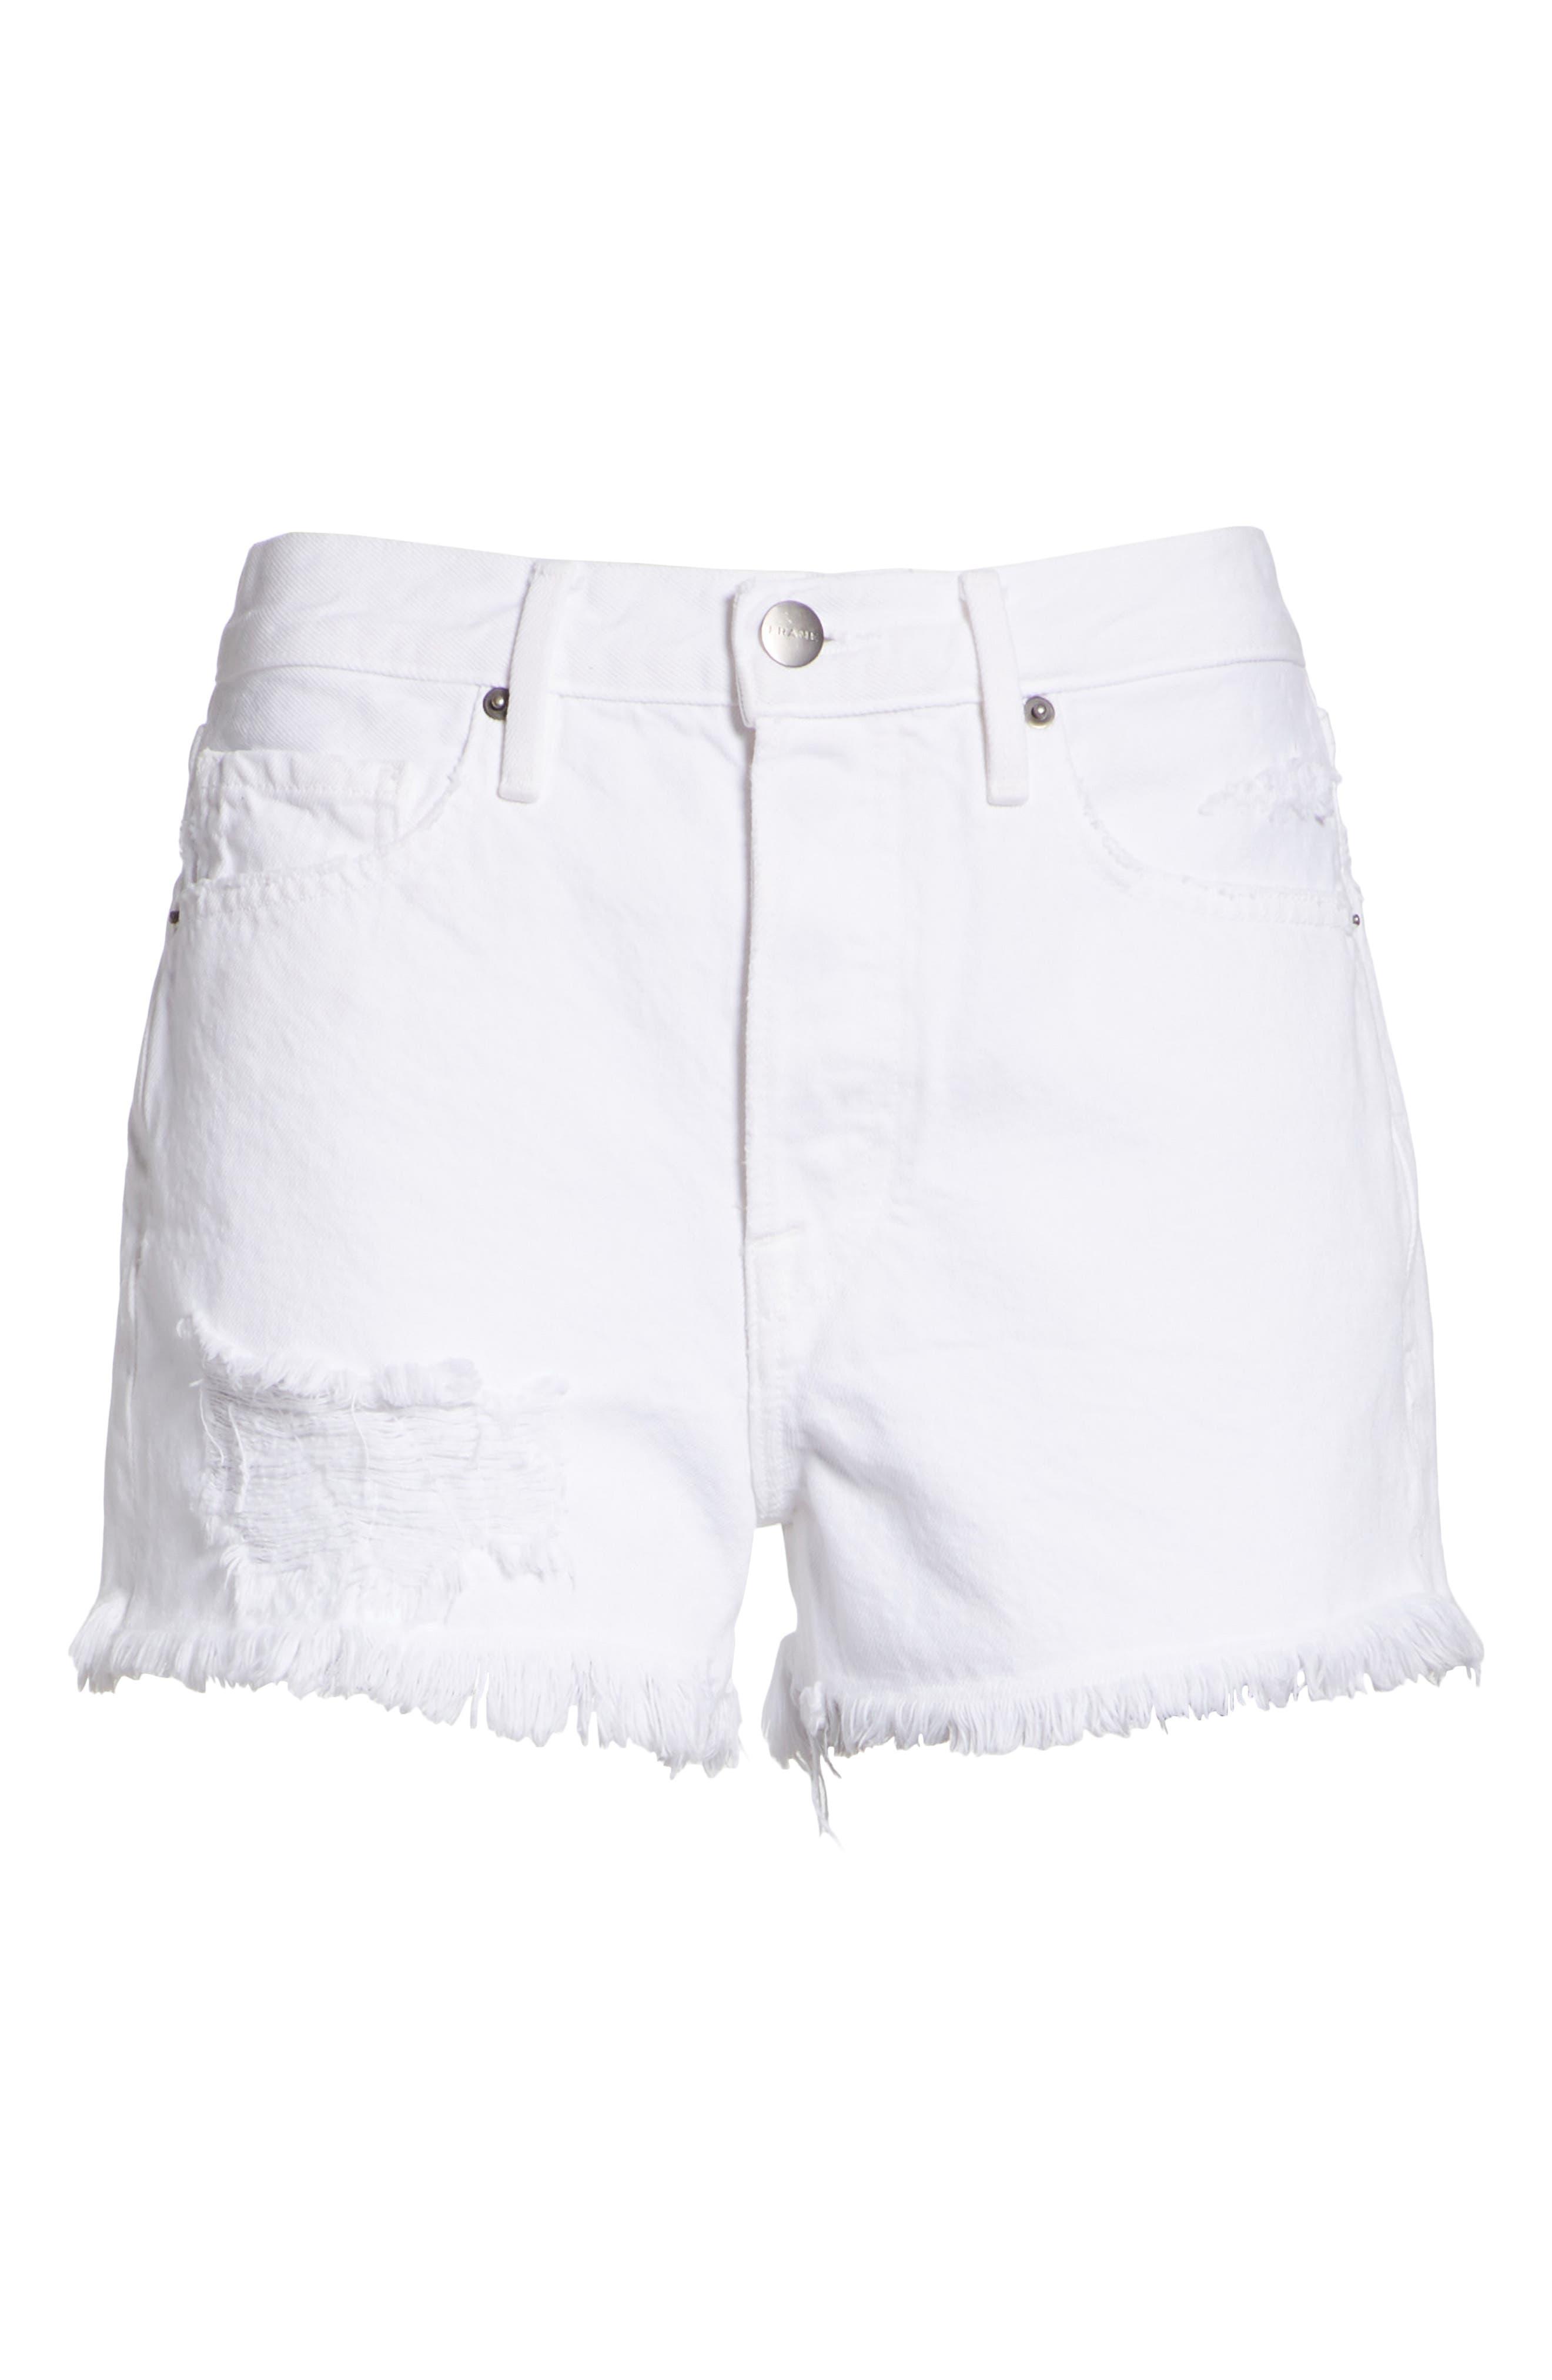 Rigid Re-Release - Le Original Shorts,                             Alternate thumbnail 6, color,                             Blanc Stockley